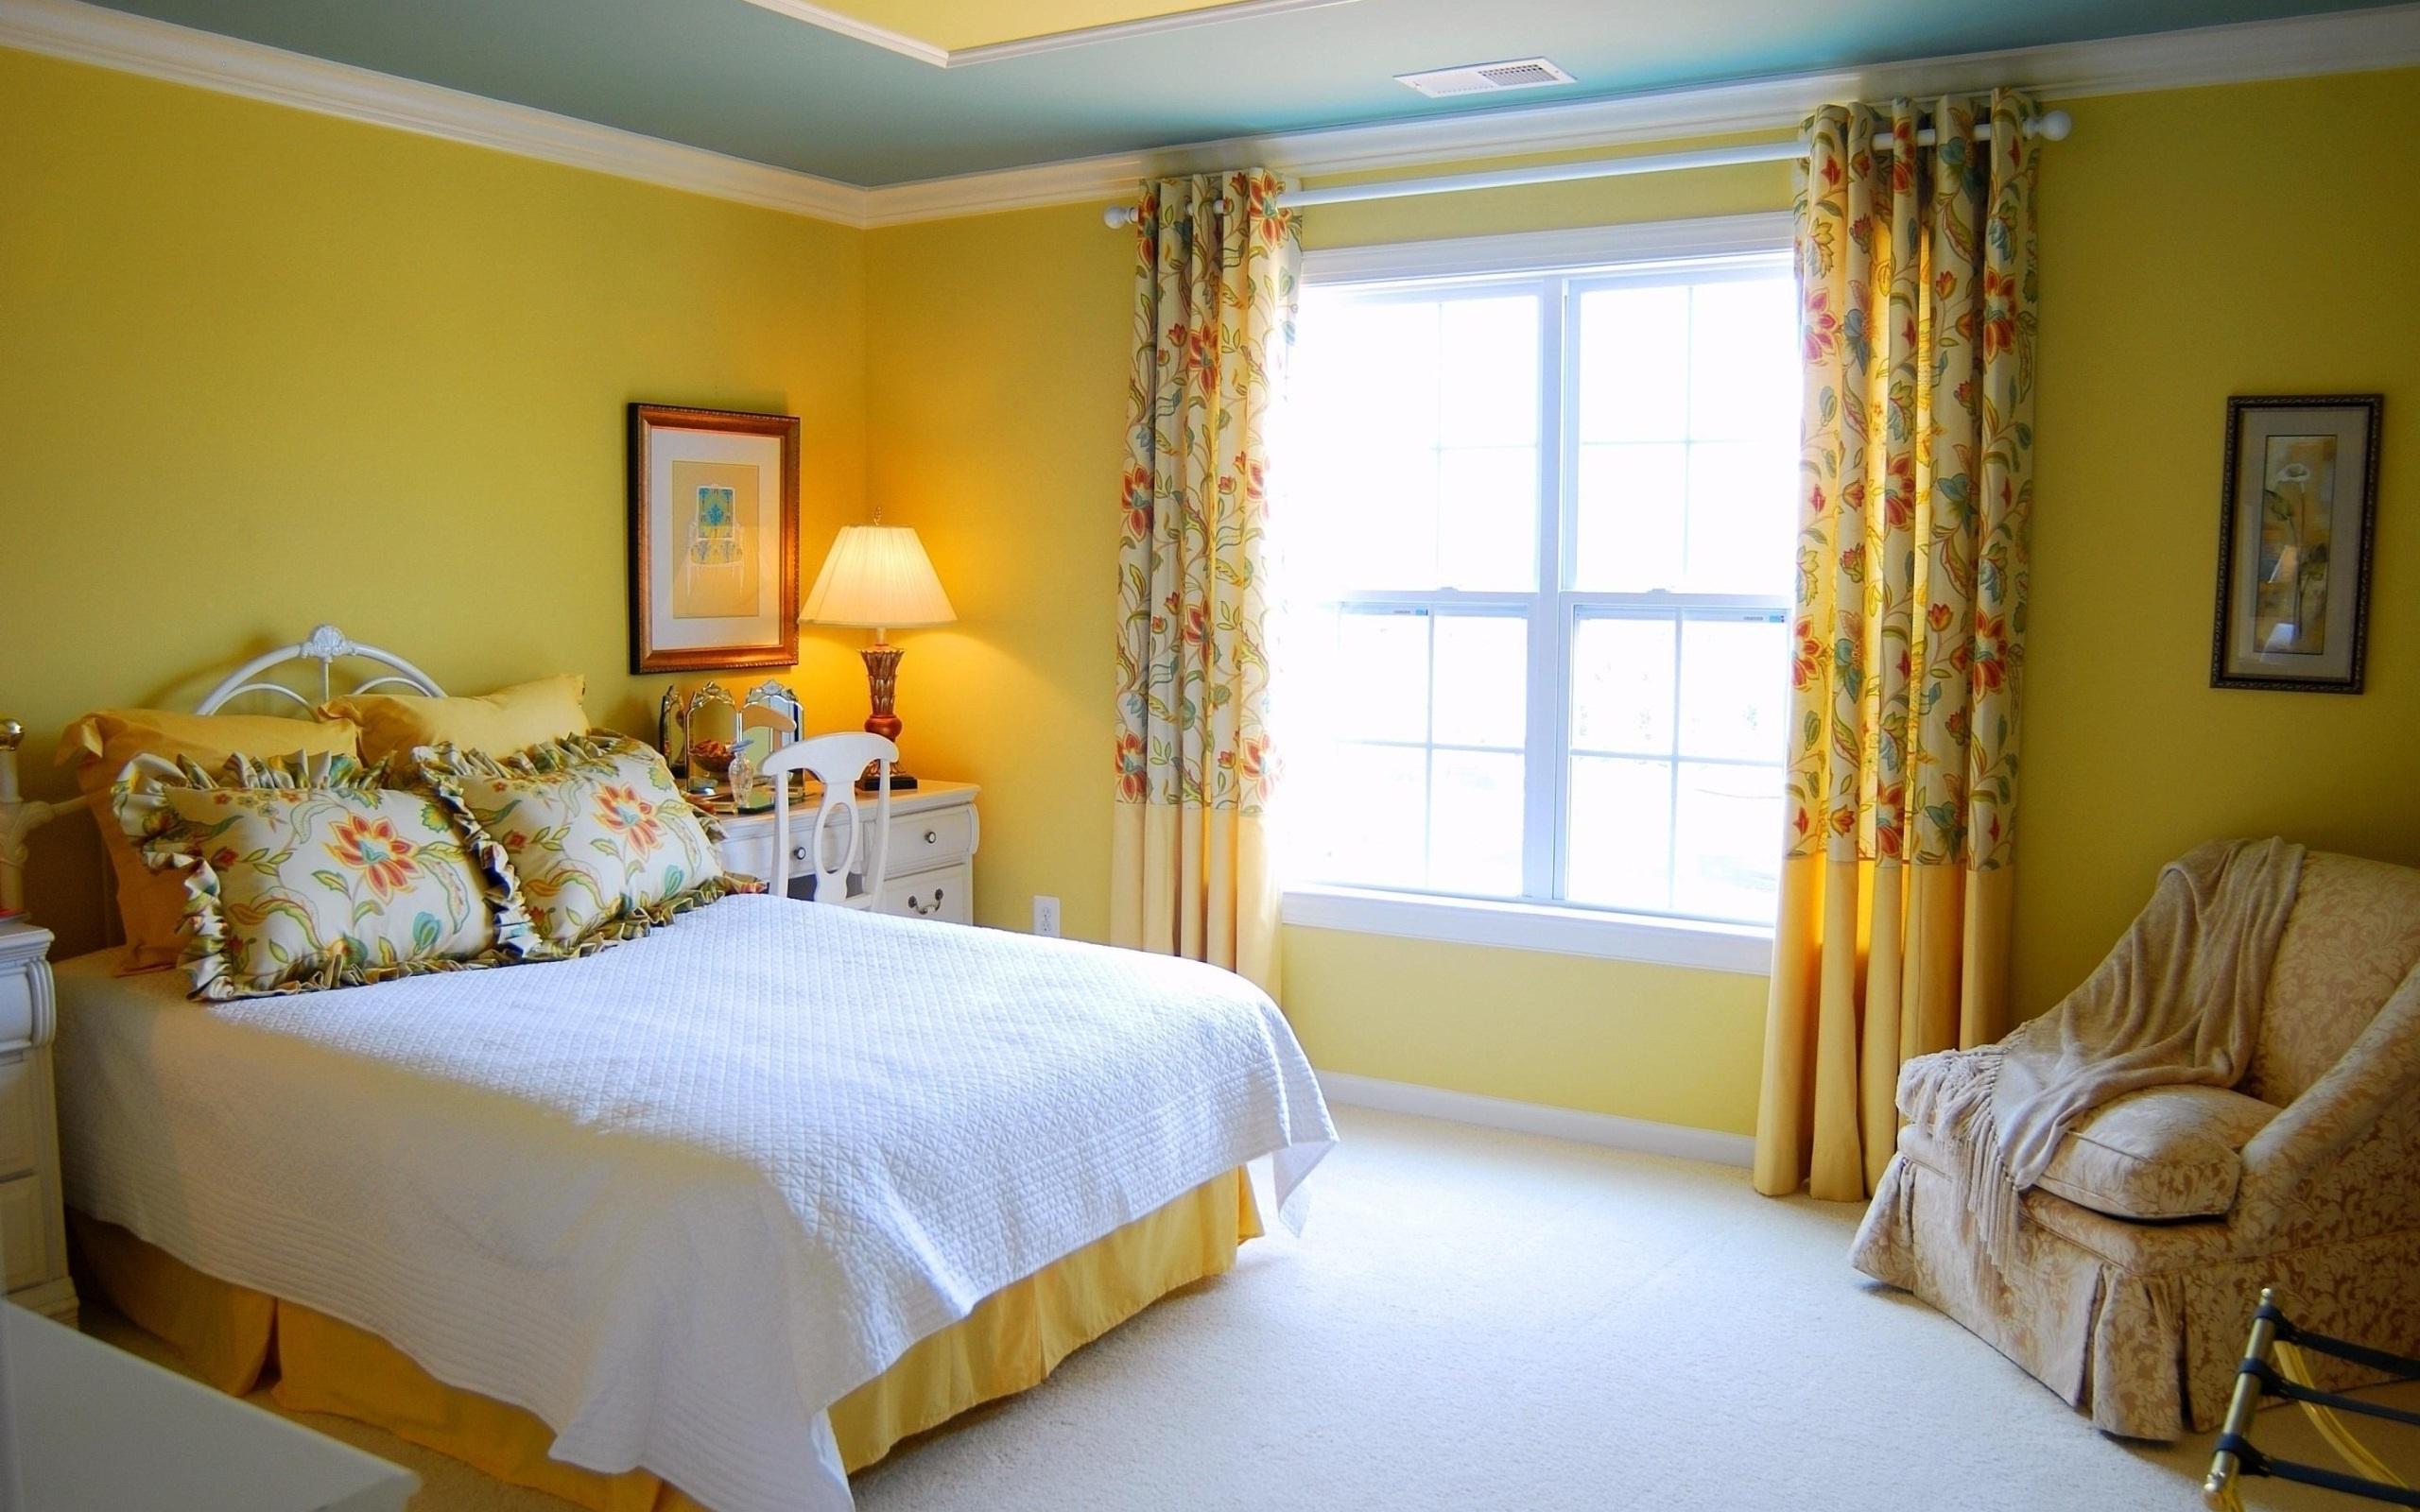 Двойные желтые шторы